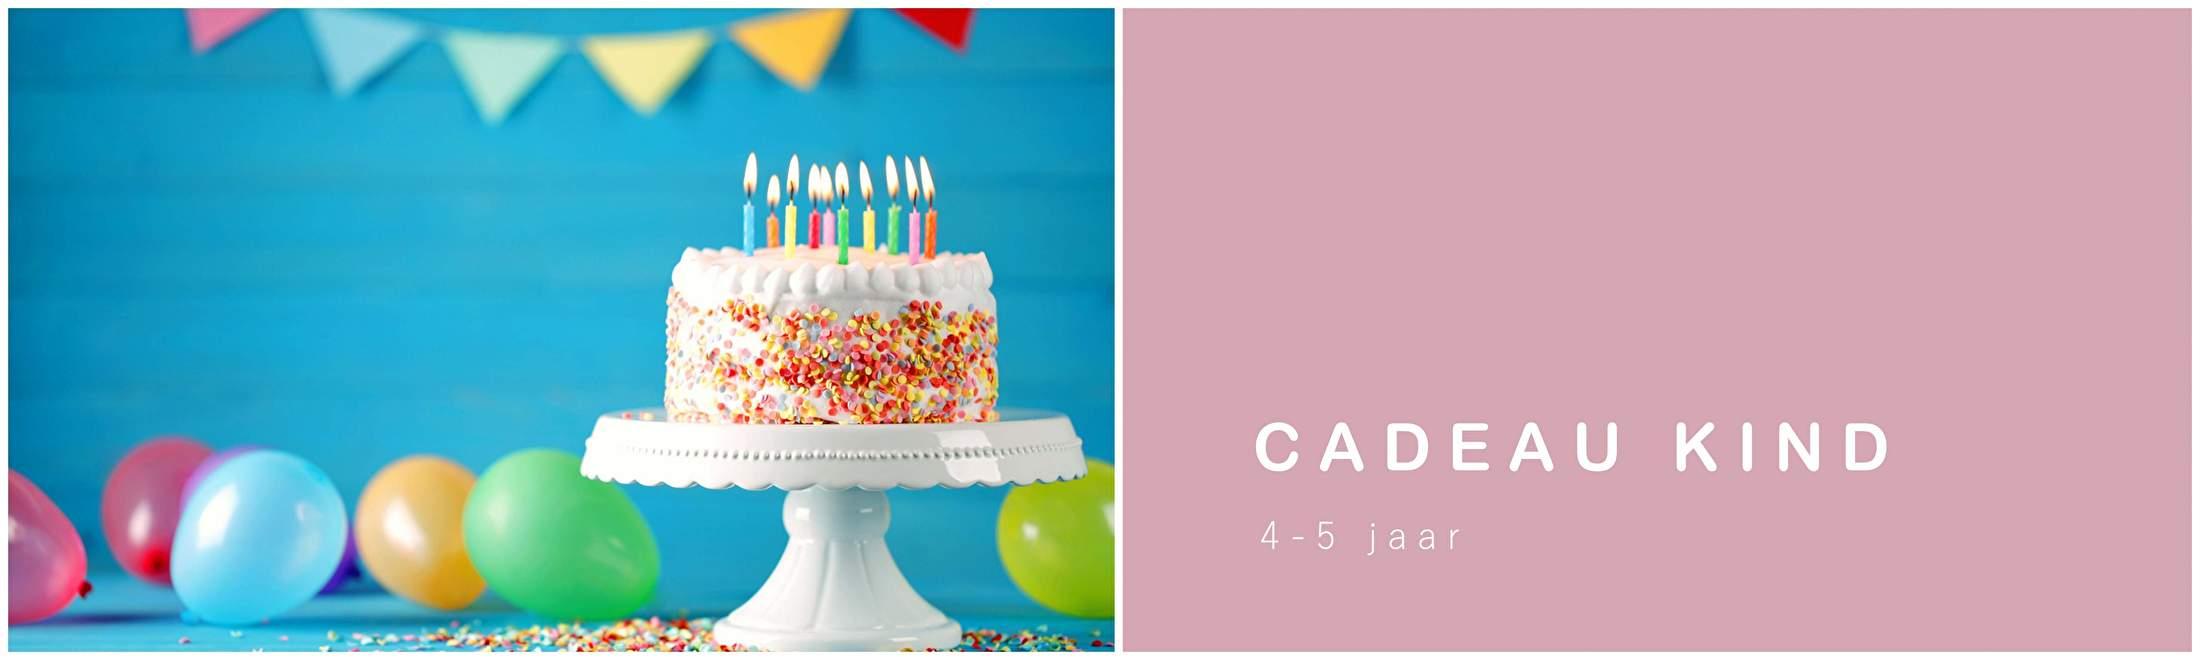 CADEAU KIND 4-5 jaar